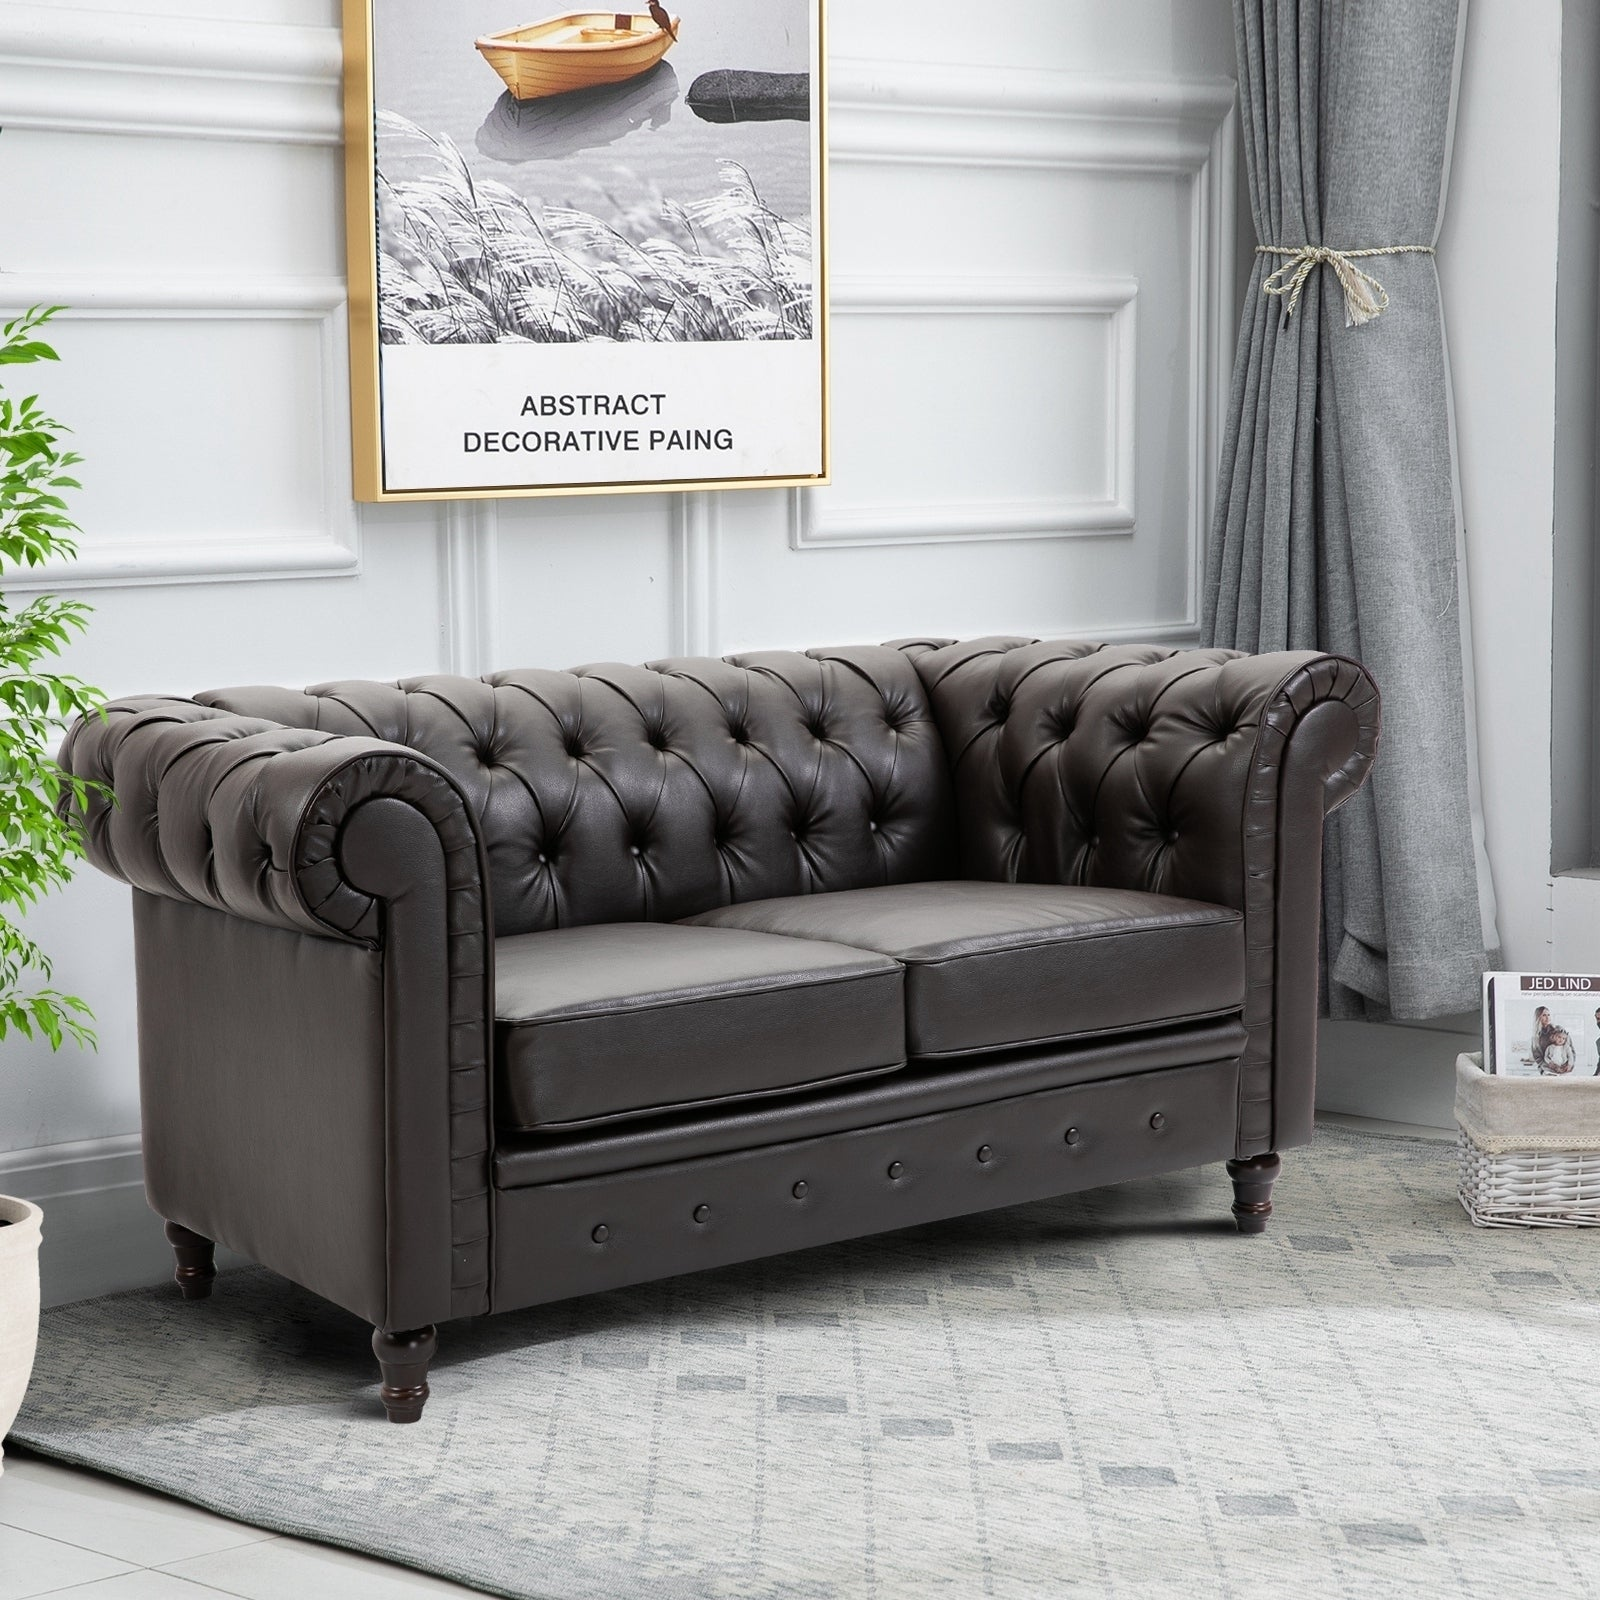 Homcom Pu Leather 2 Or 3 Seater